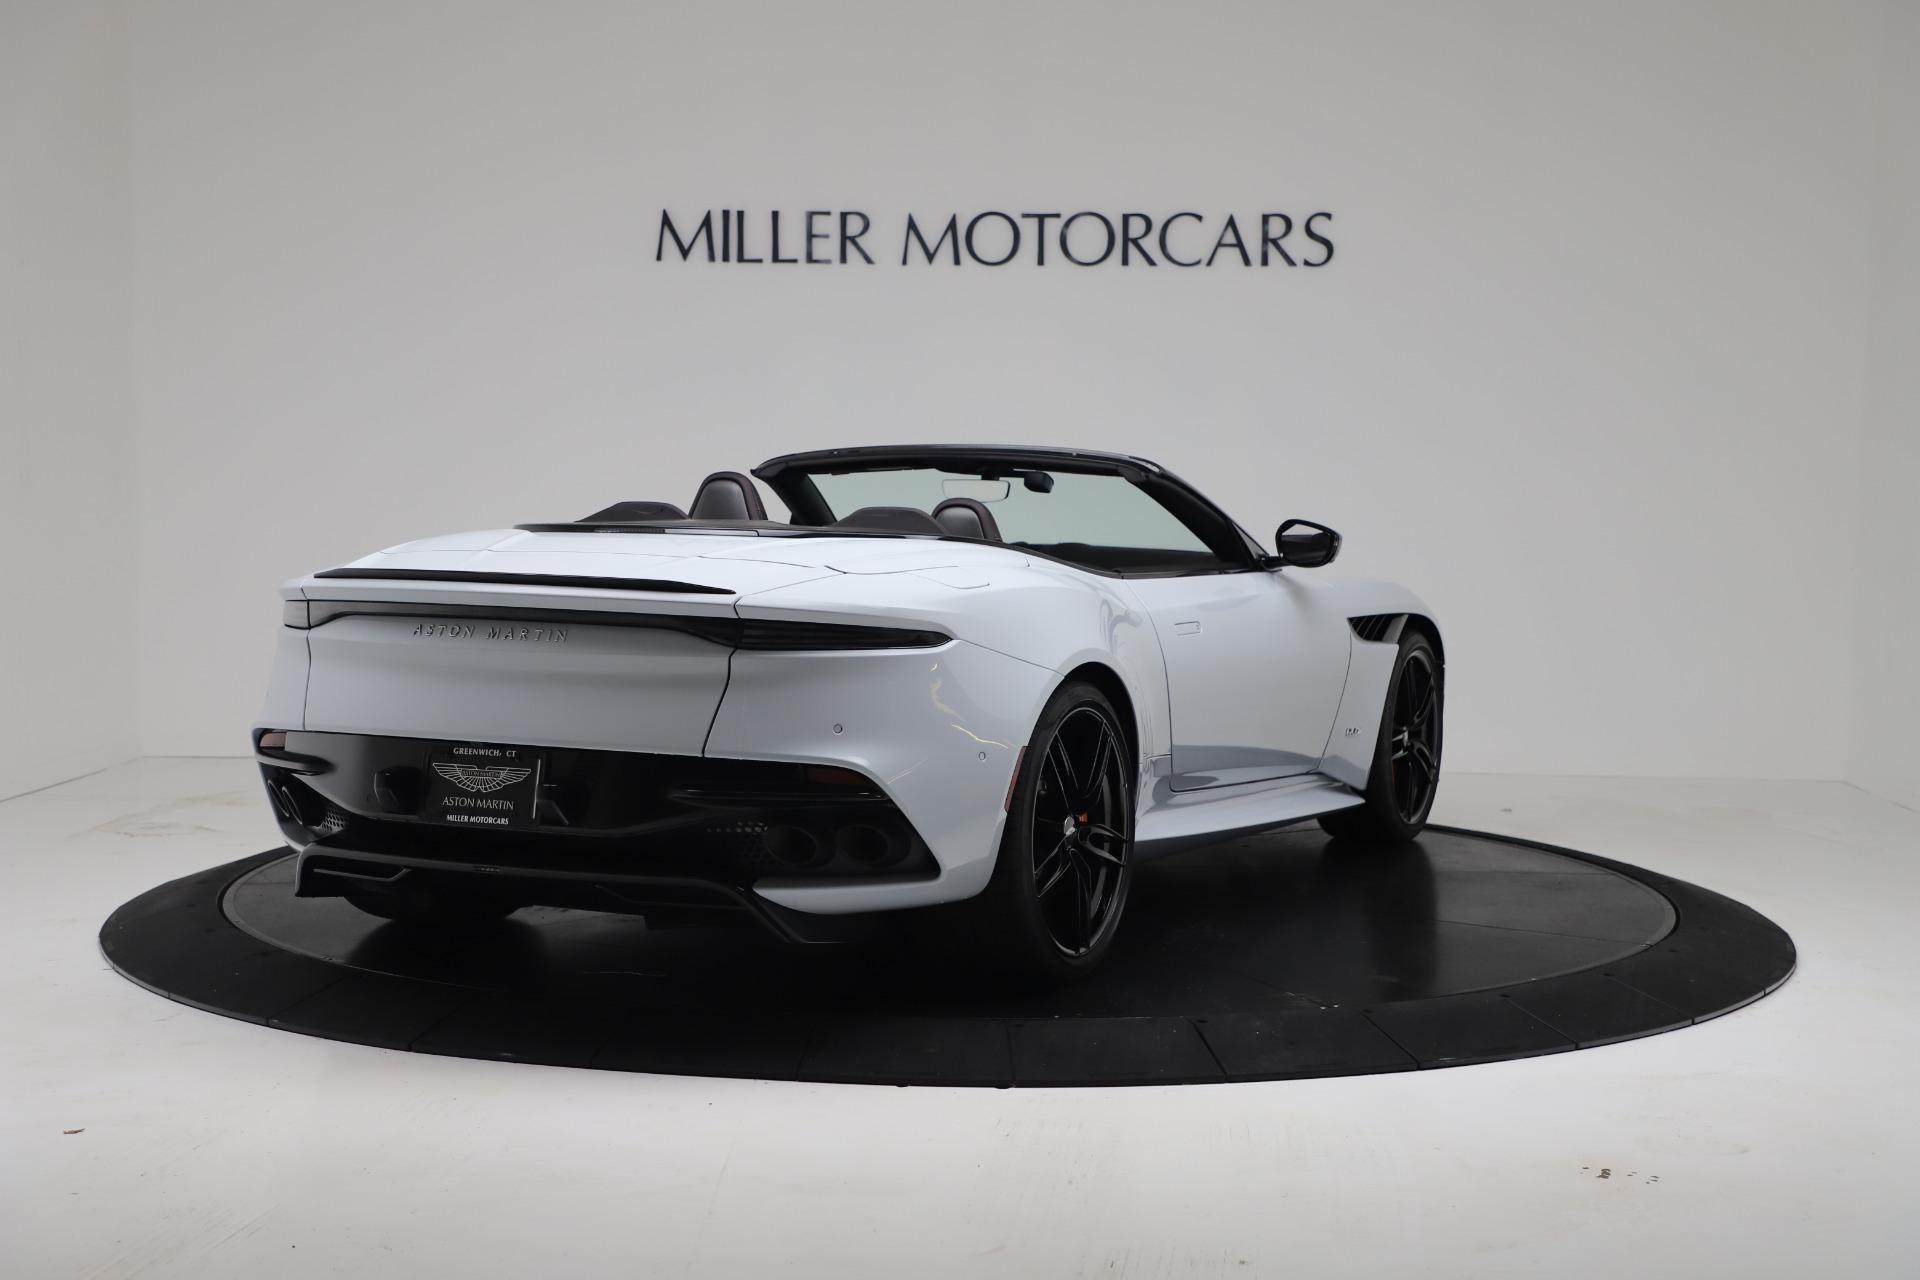 New 2020 Aston Martin DBS Superleggera Volante Convertible For Sale In Westport, CT 3484_p6